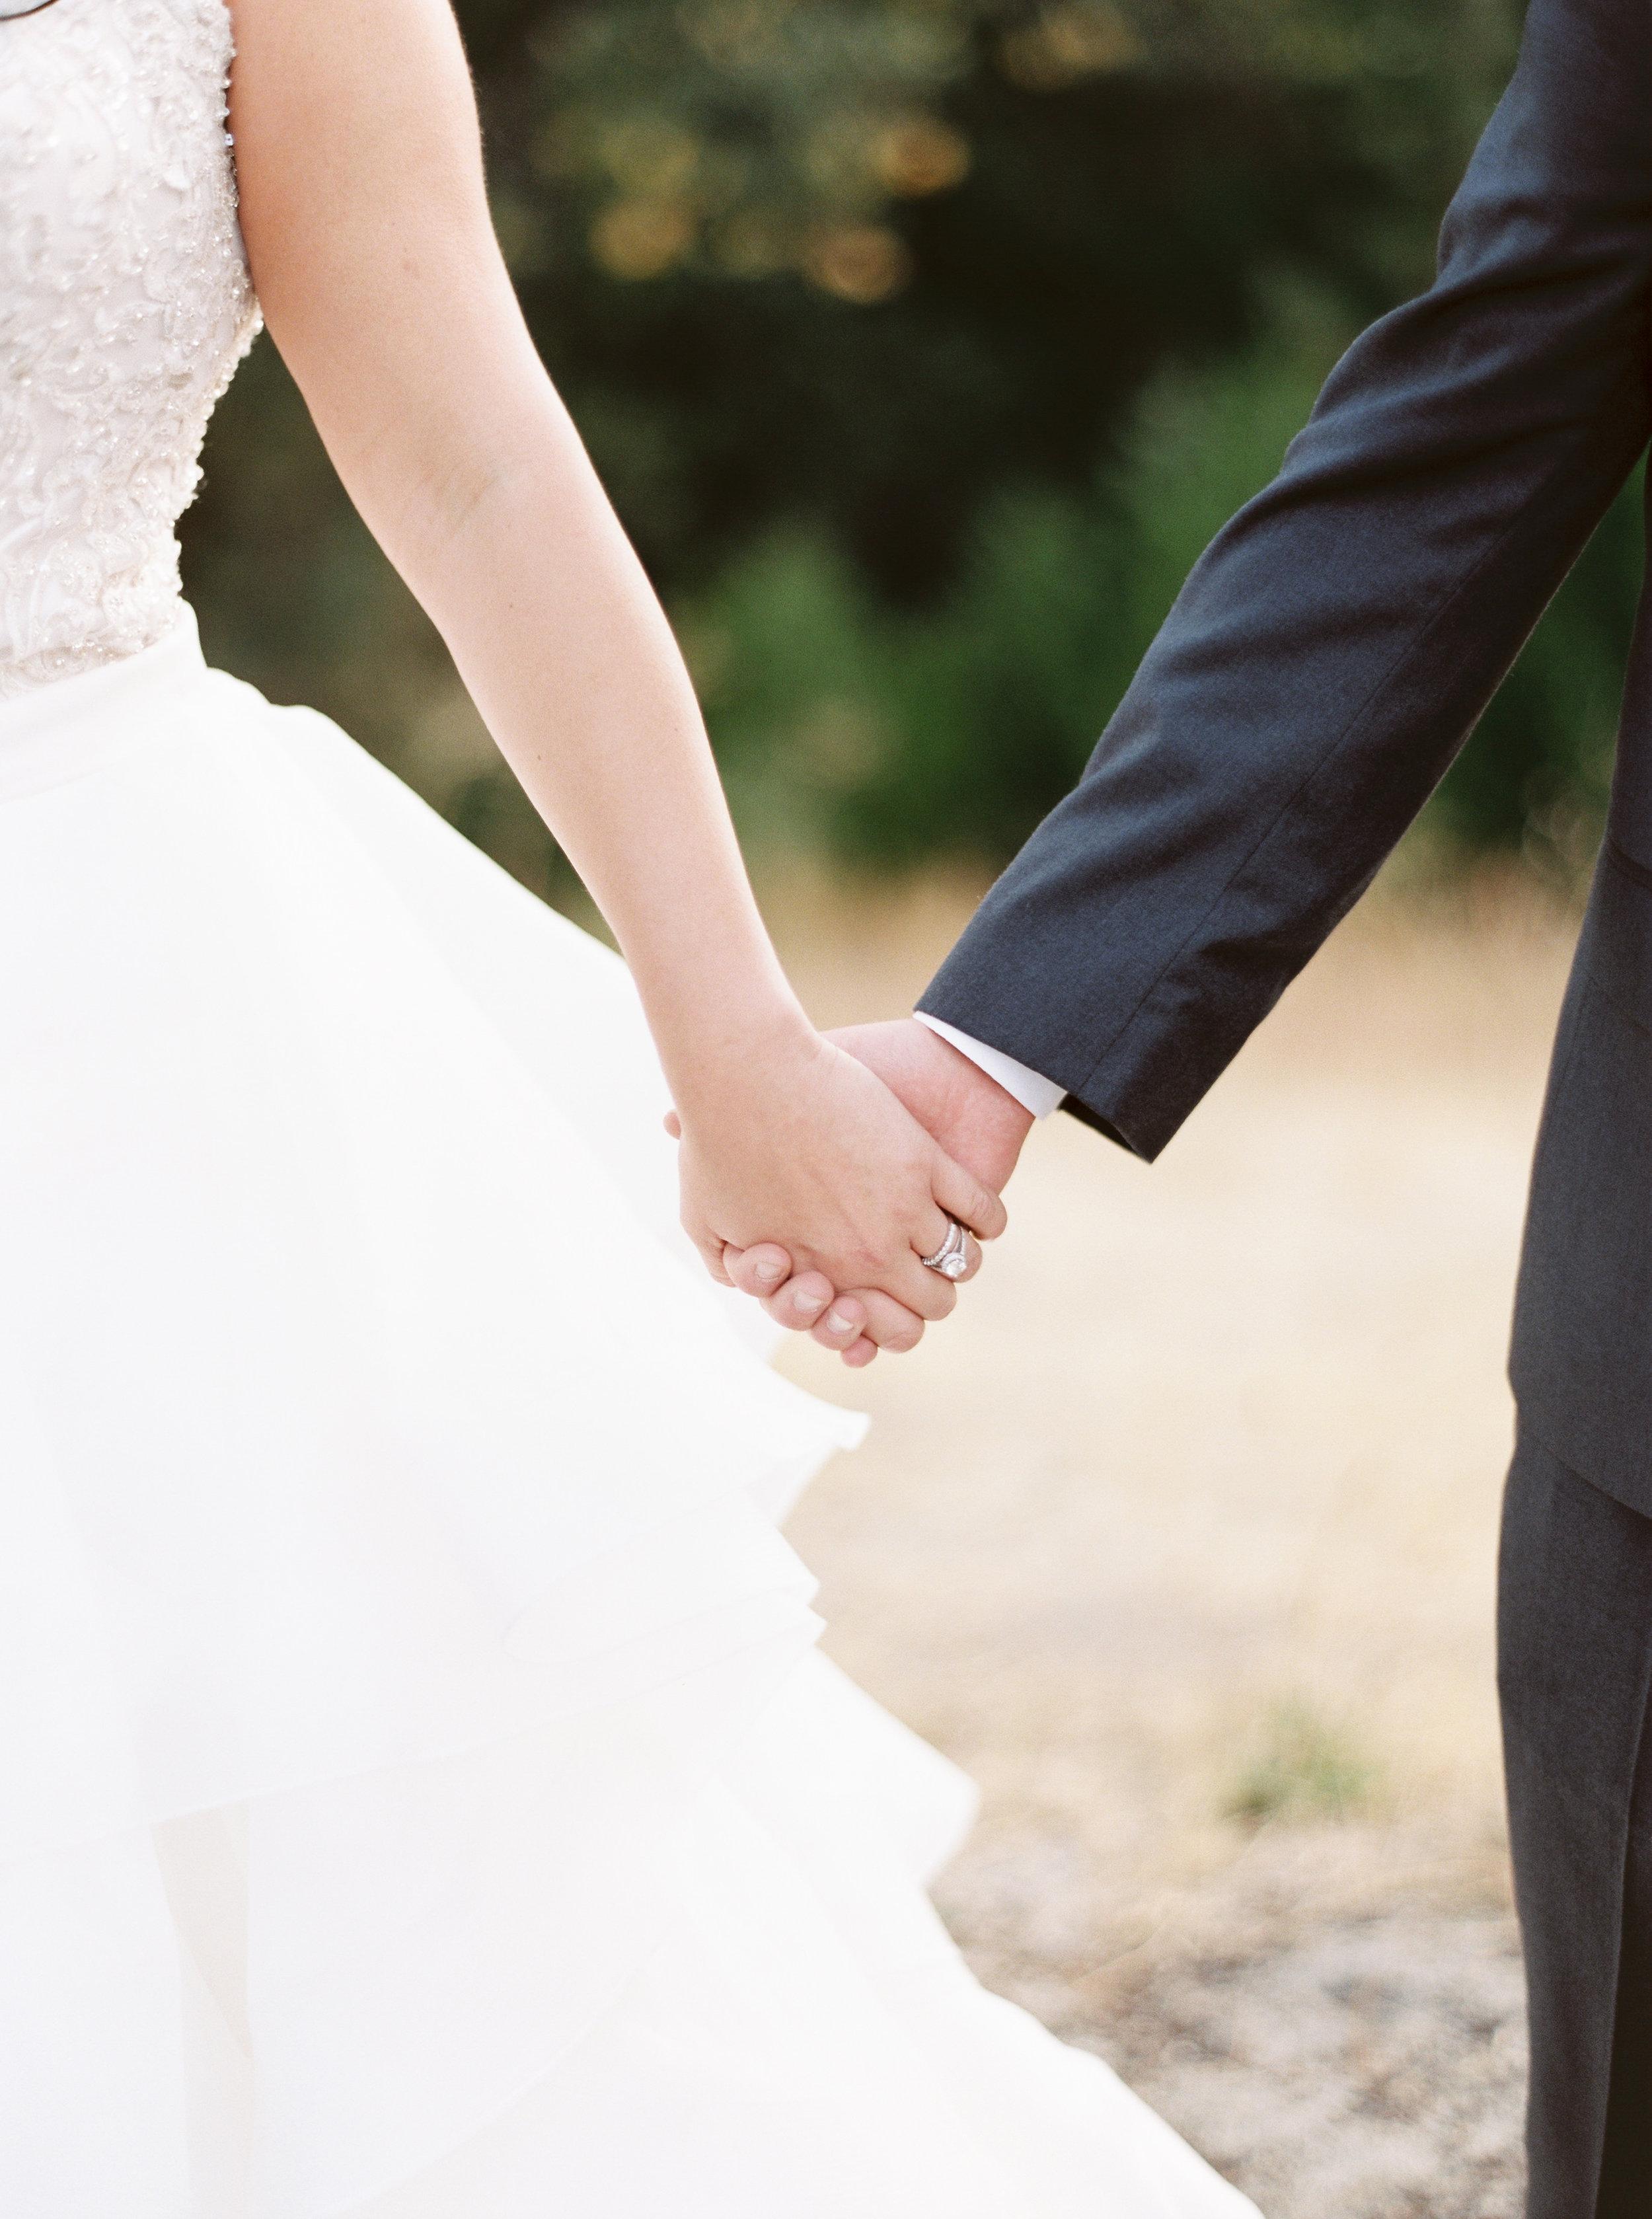 Tenaya-lodge-wedding-at-yosemite-national-park-california-55.jpg